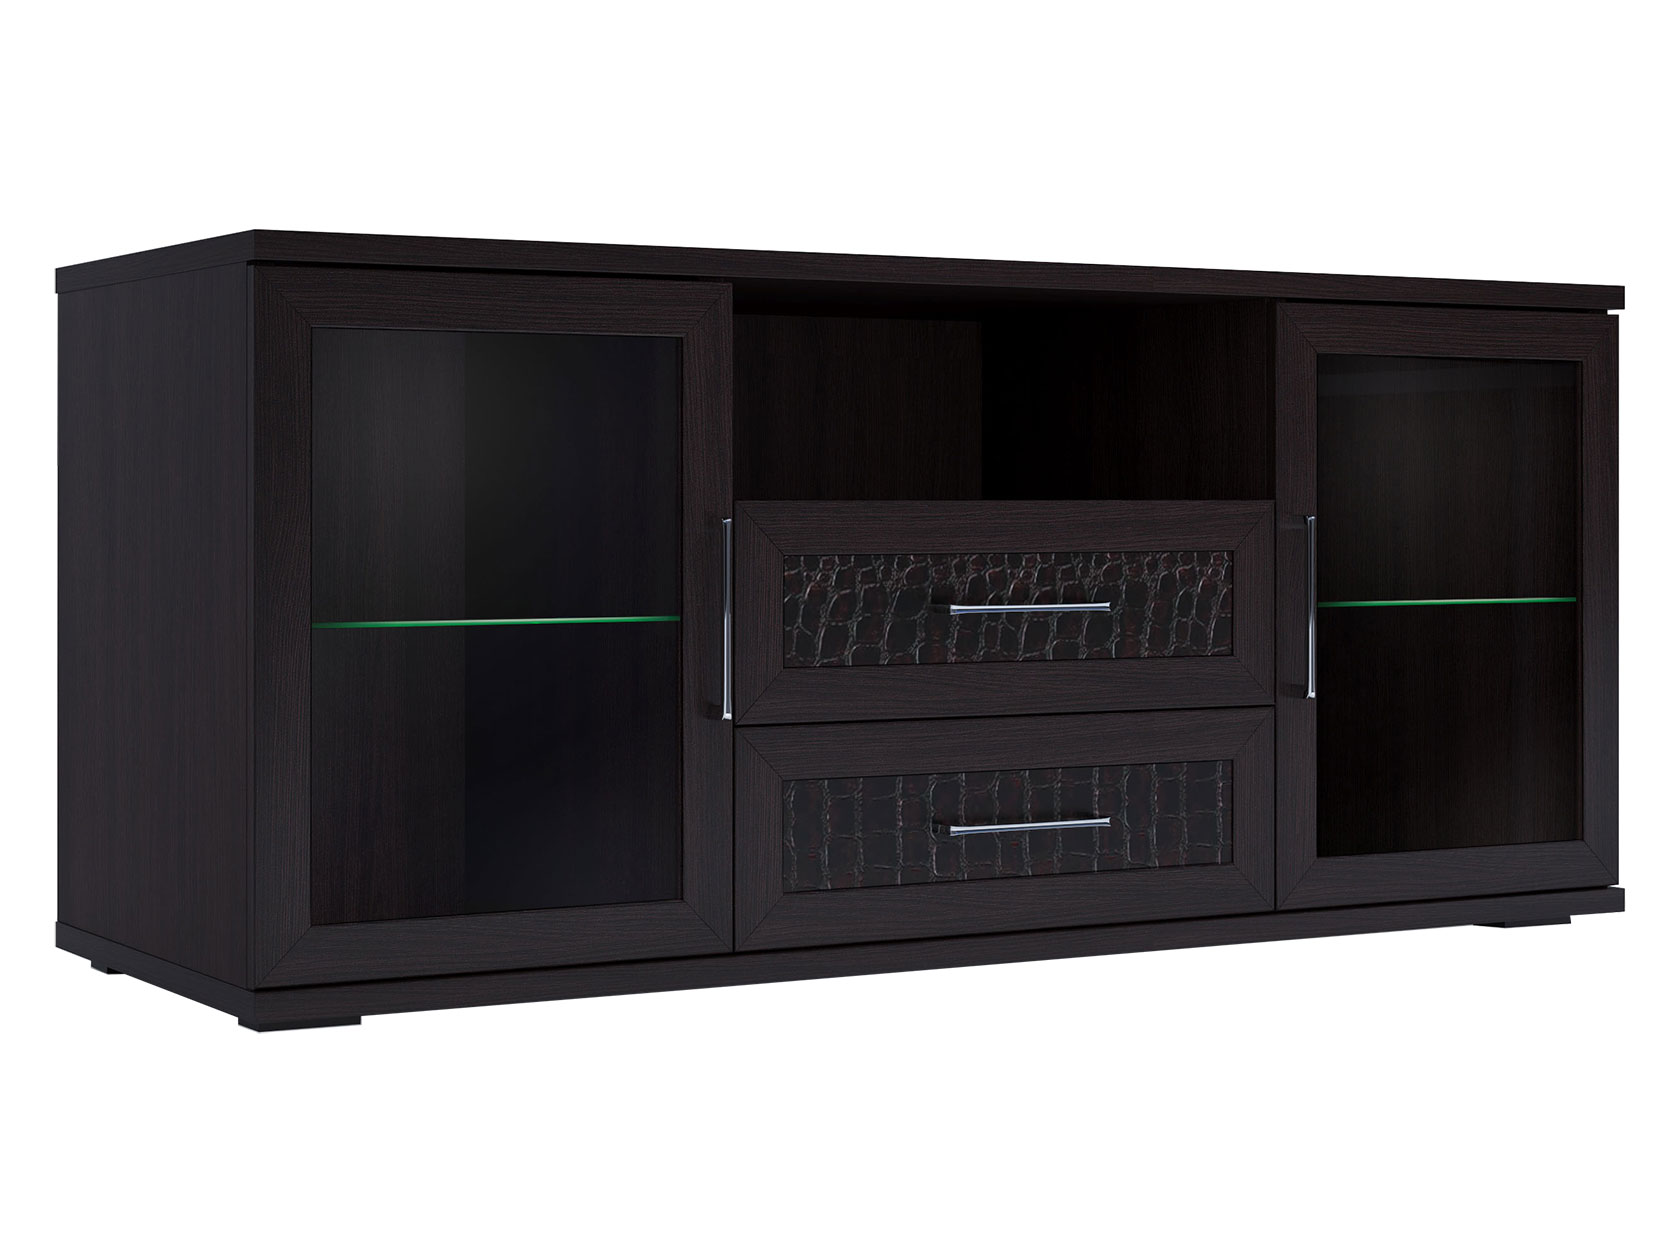 ТВ-тумба 150-65661